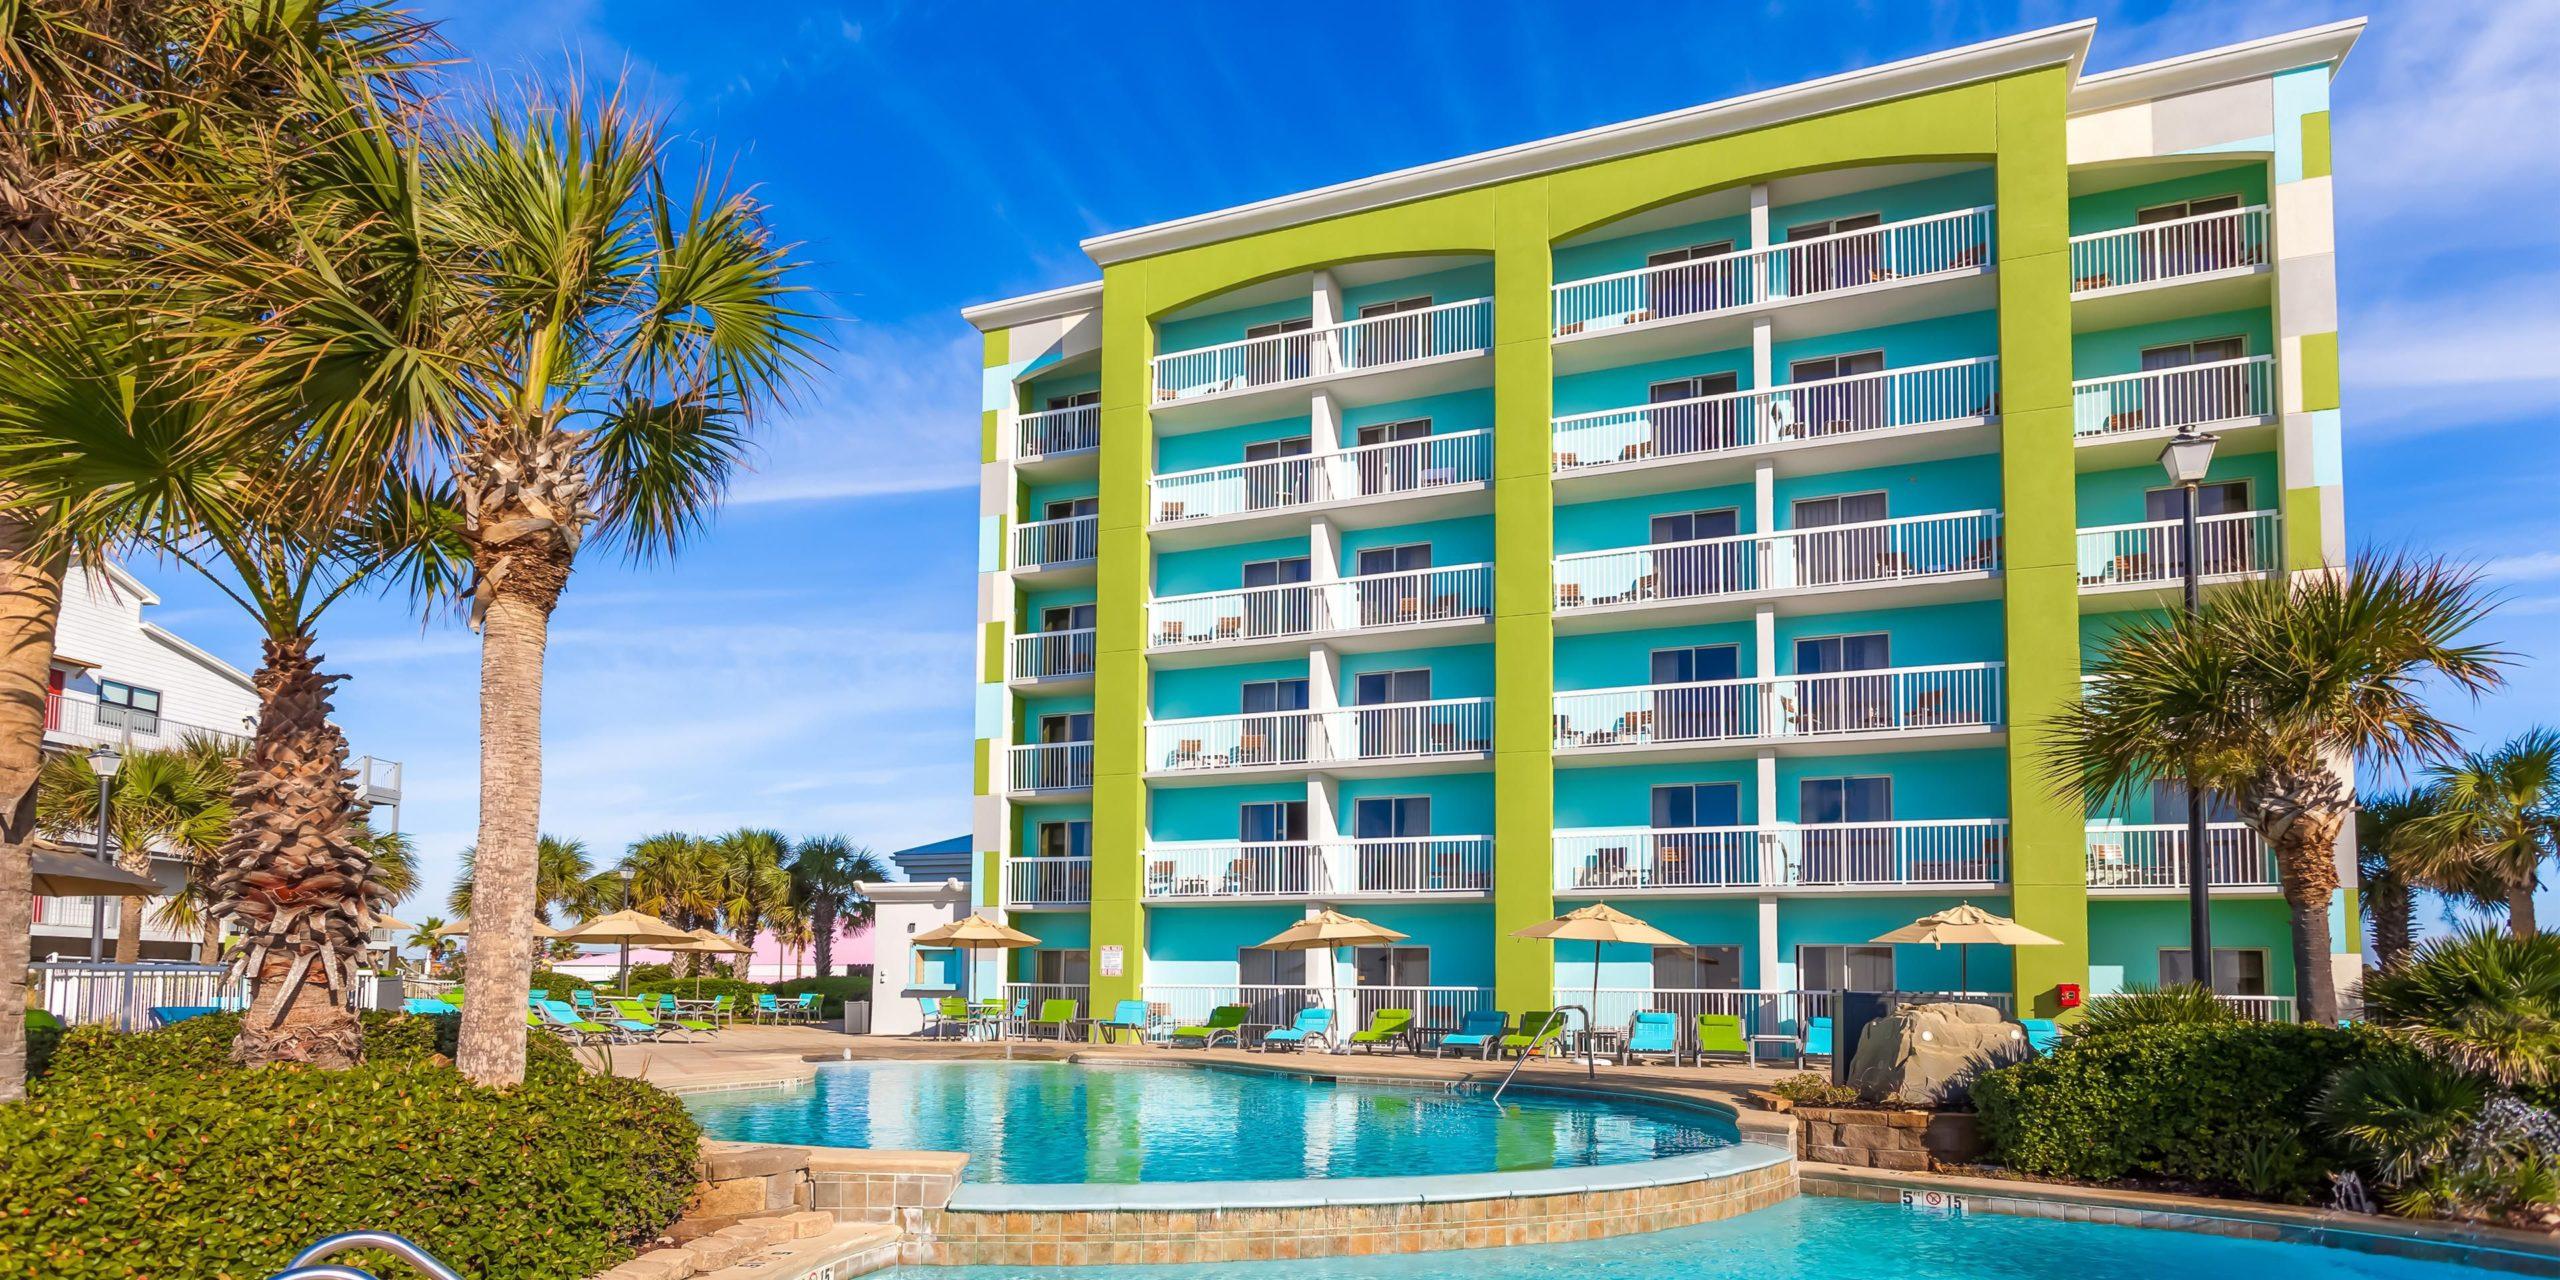 Luxurious Beach hotel